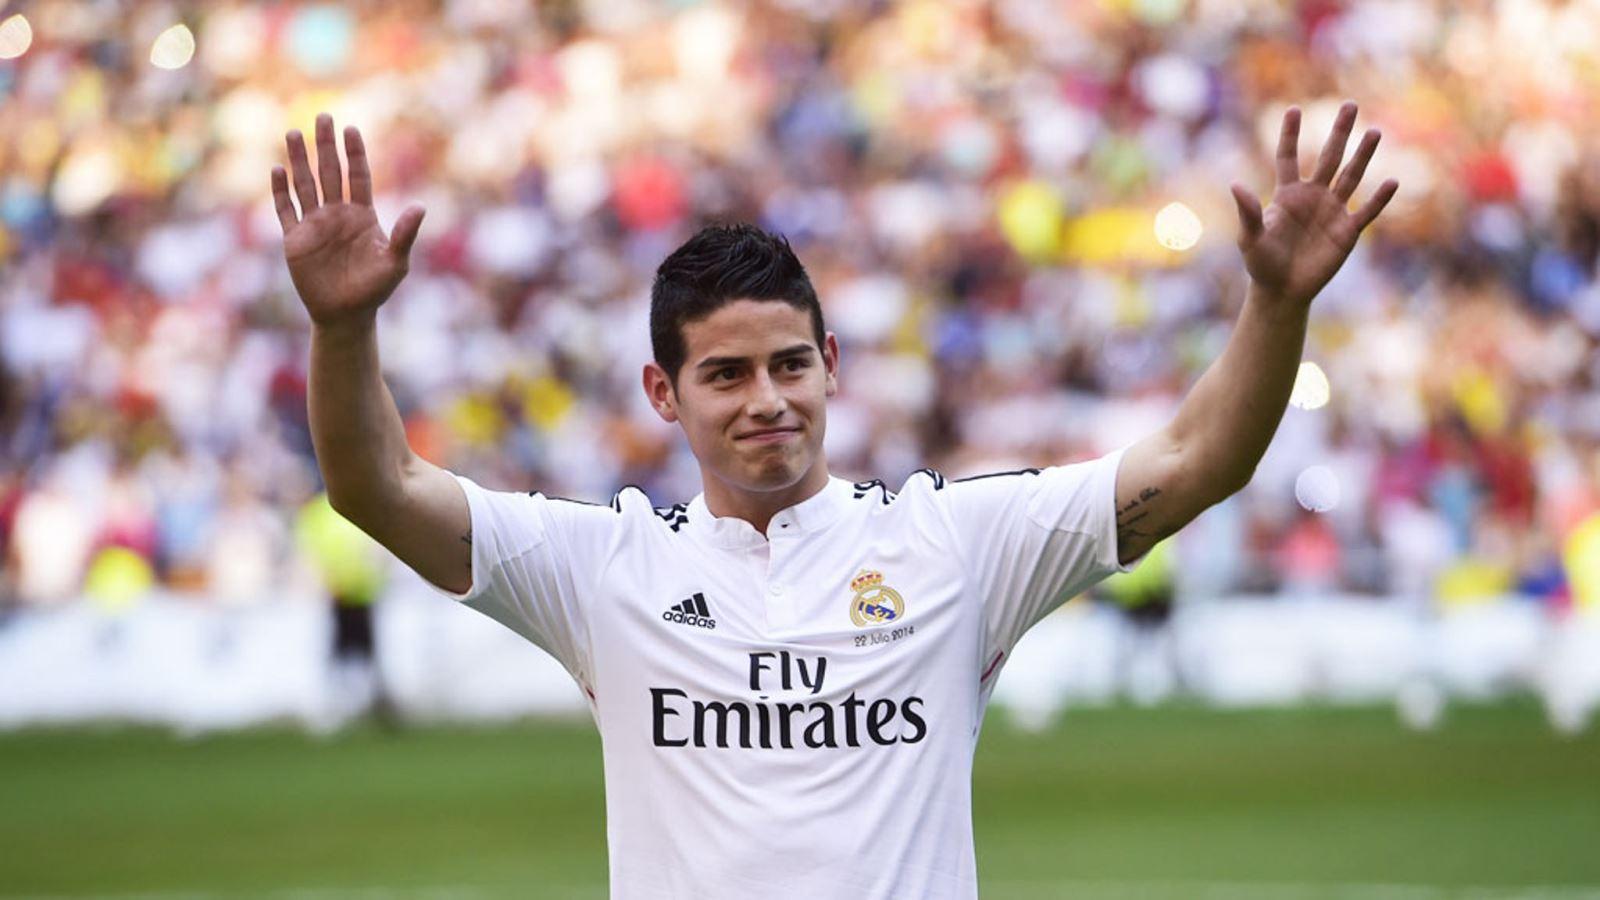 Real, chuyển nhượng Real, Real Madrid, chuyển nhượng Real Madrid, Real Madrid mua Mbappe, Real mua Eriksen, Mbappe, Eriksen, James Rodriguez, Atletico, Kovacic, Chelsea